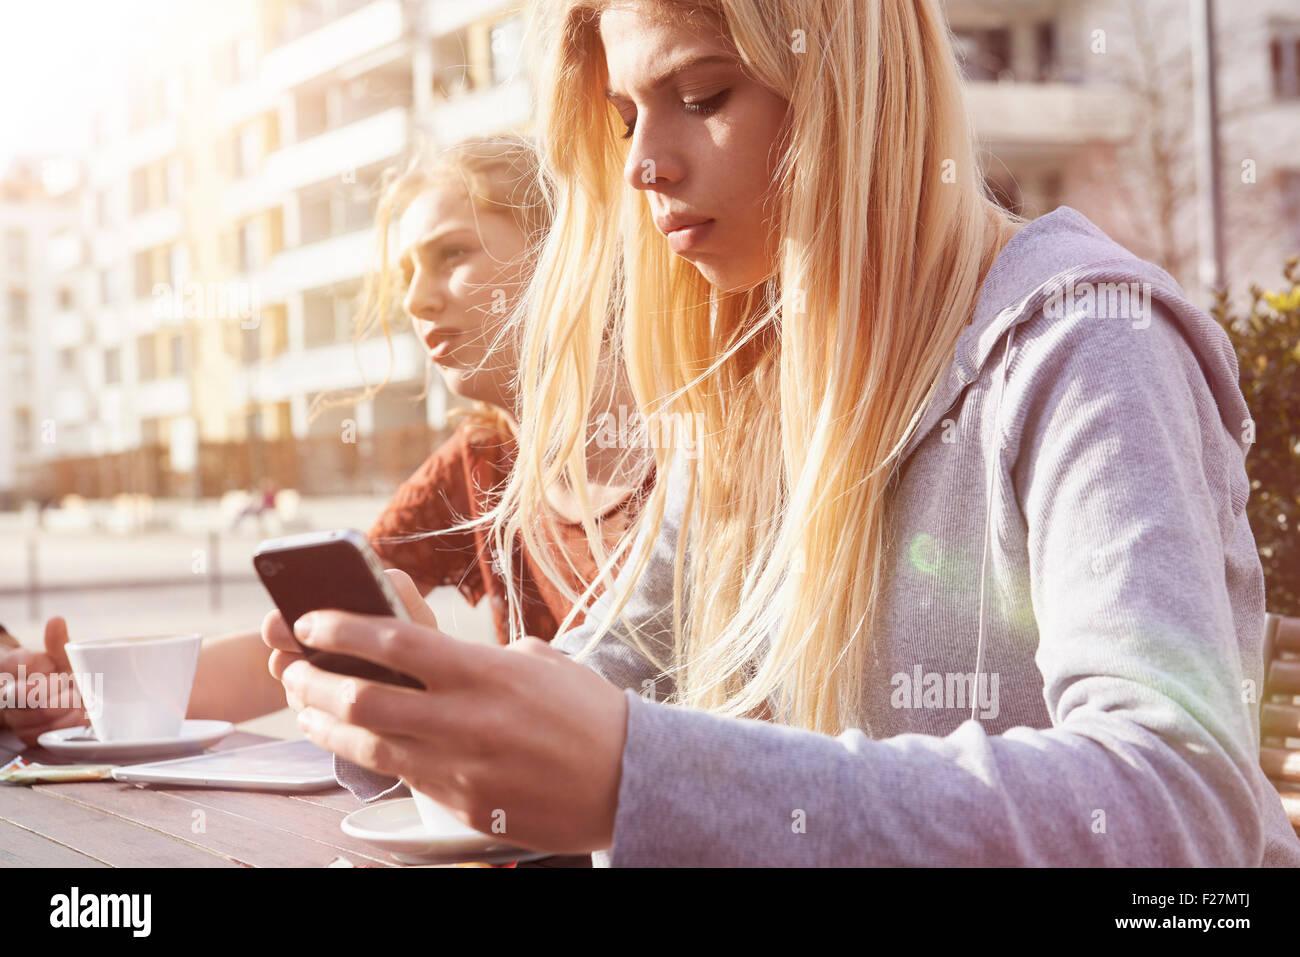 Teenage girl text messaging at sidewalk cafe, Munich, Bavaria, German - Stock Image